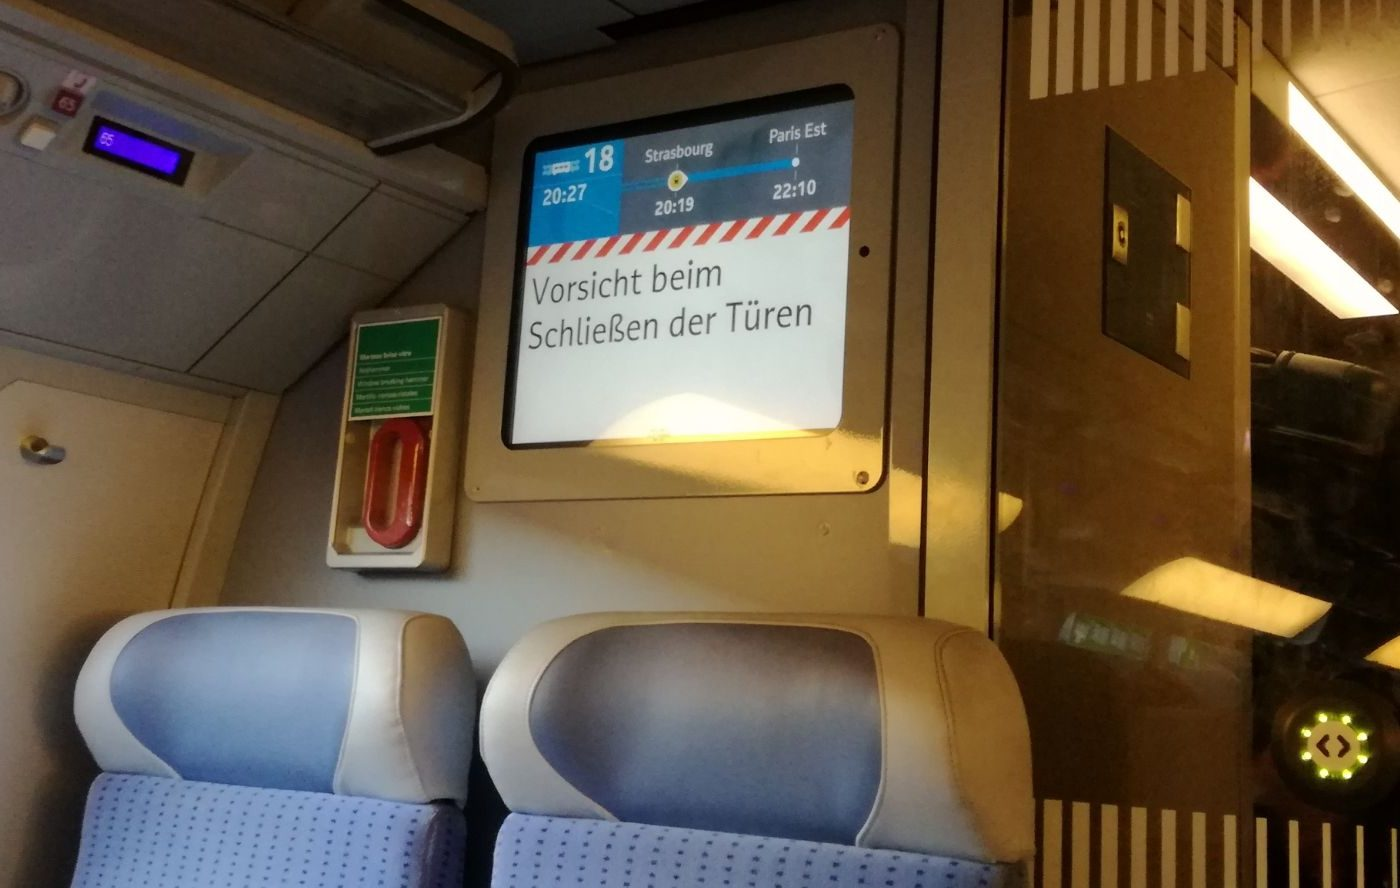 Unutrašnjost TGV-a / Foto: Dolores Šupljika